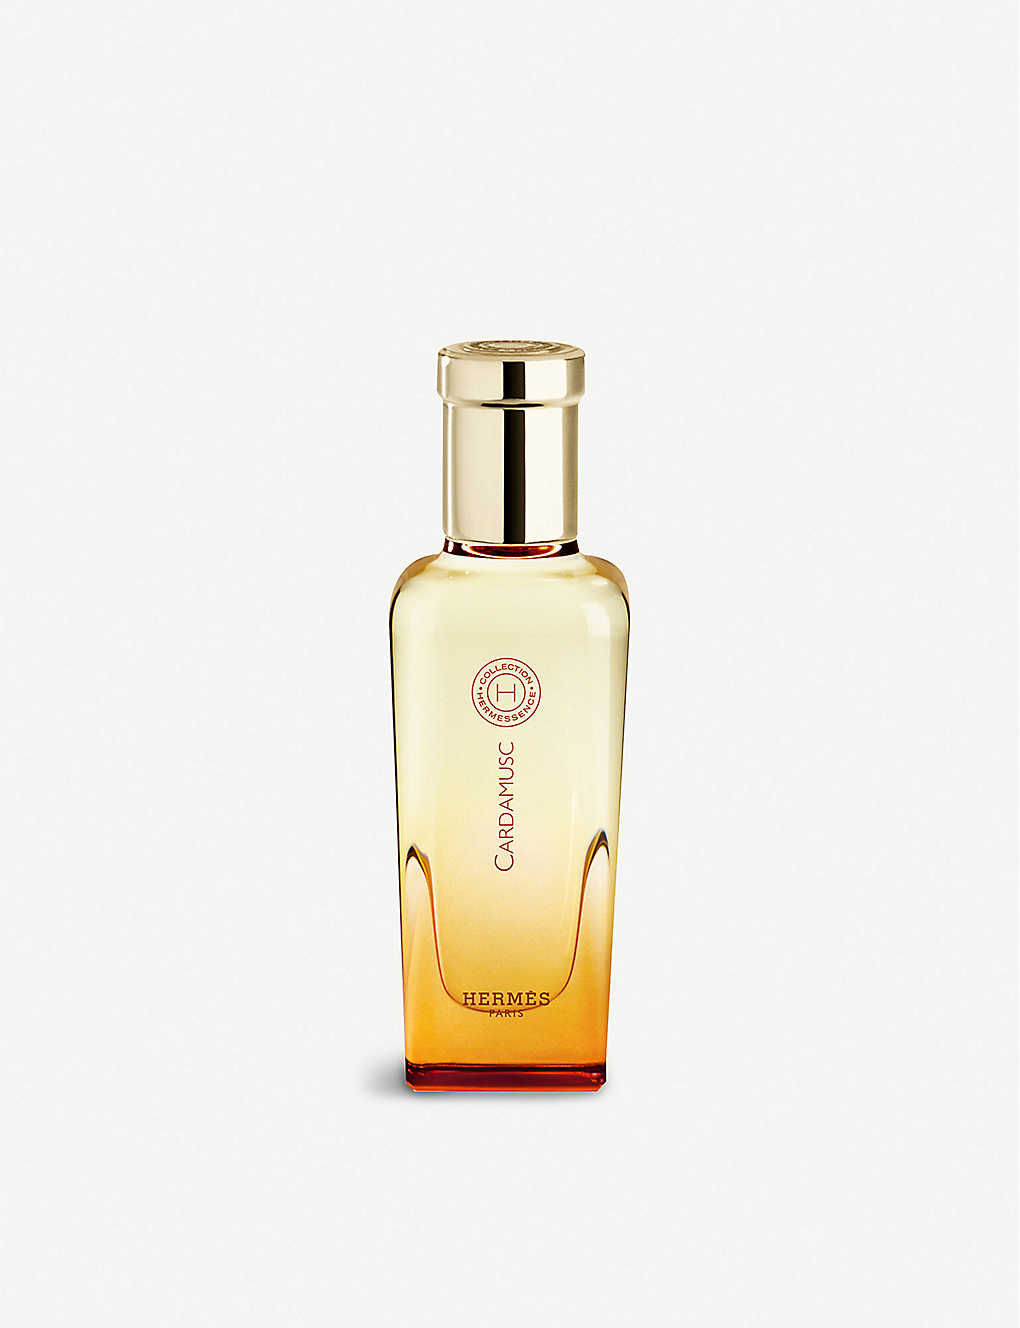 HERMES: Hermessence Collection Cardamusc Essence de parfum 20ml